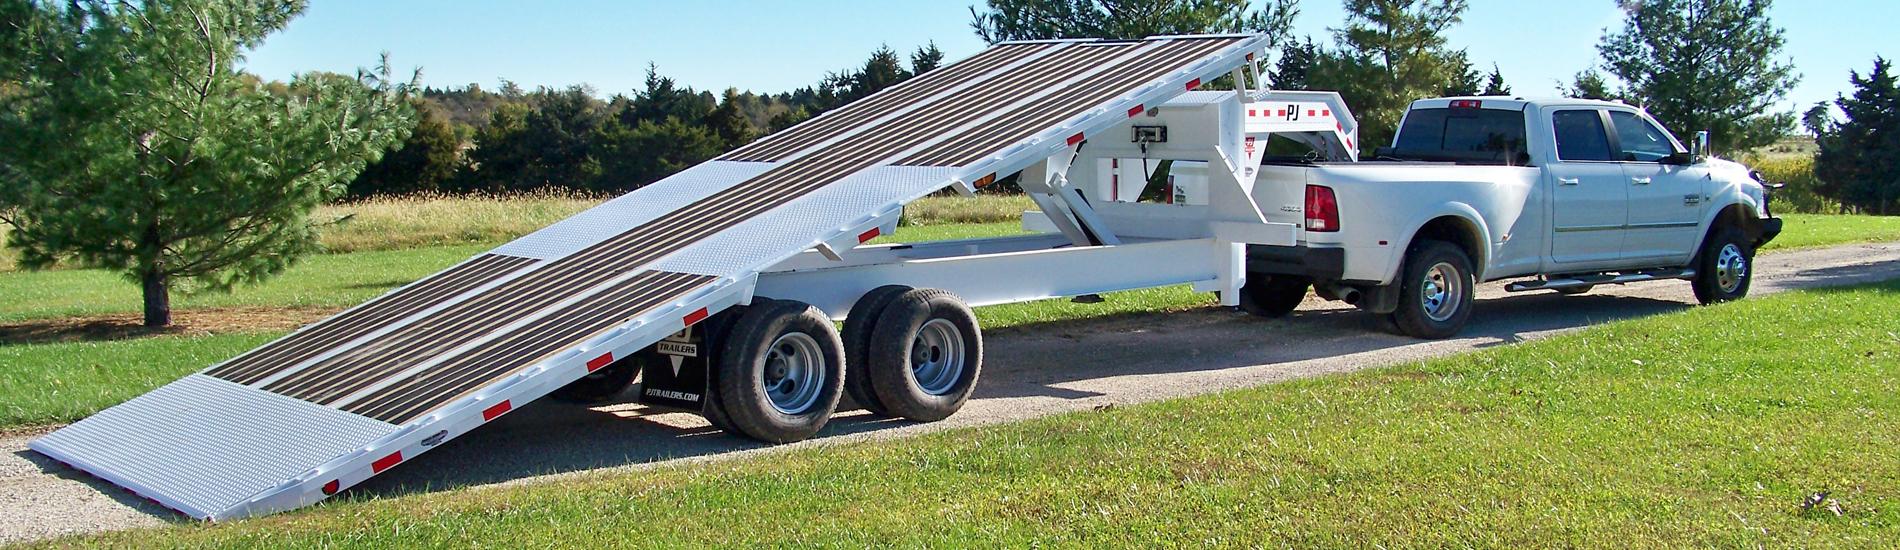 Home Page Trailer Truck Accessories Dealer In Versailles Mo Skid Steer Trailers On Utility Wiring And Lights Repair Pj Td Tilt Sundowner Aluminum Stock